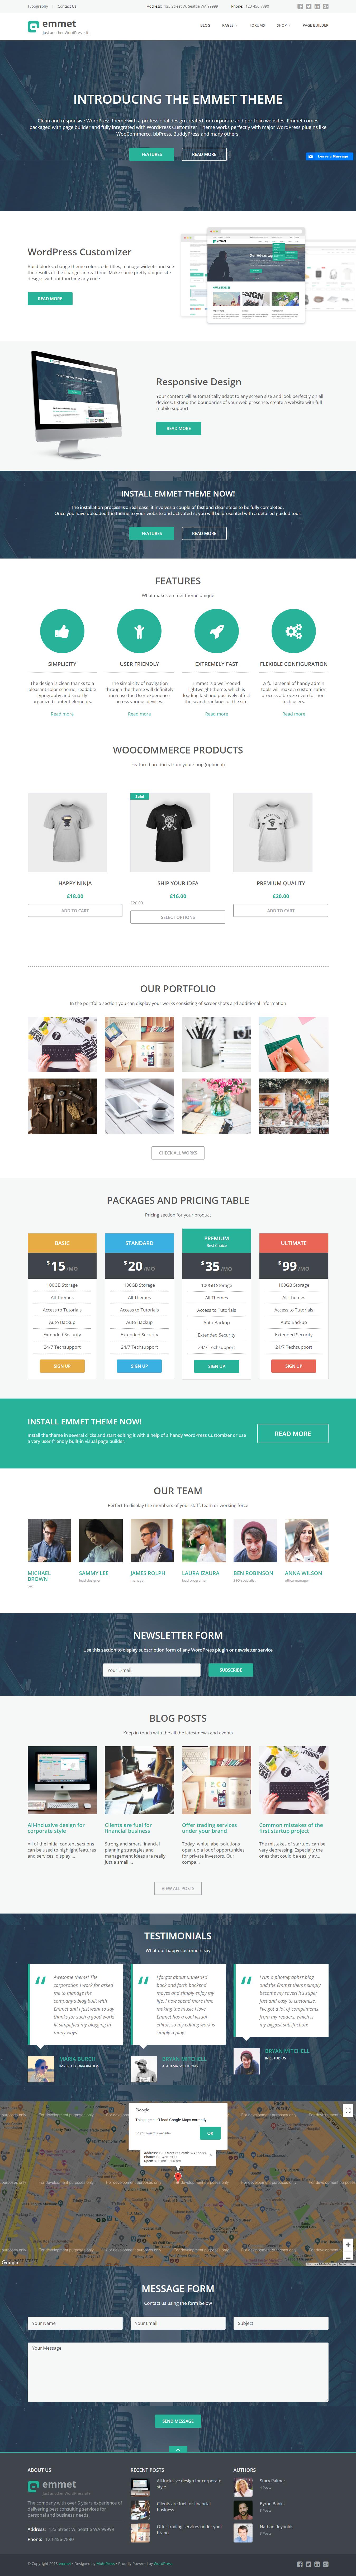 Emmet Lite - Best Free BuddyPress WordPress Theme